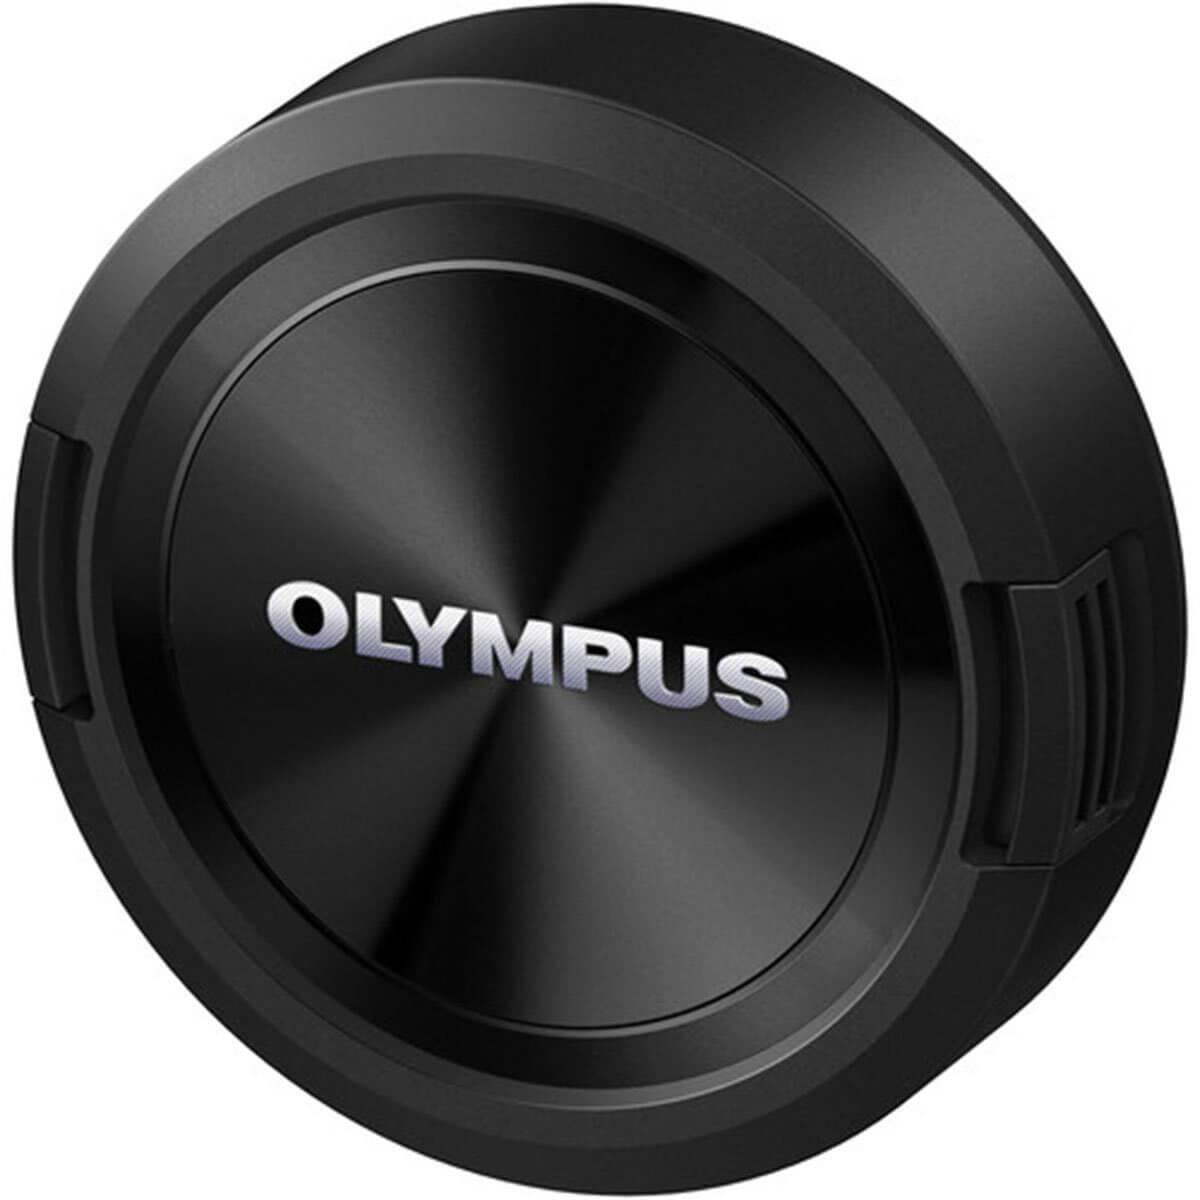 Olympus M.Zuiko 8mm f1.8 PRO Fisheye 8